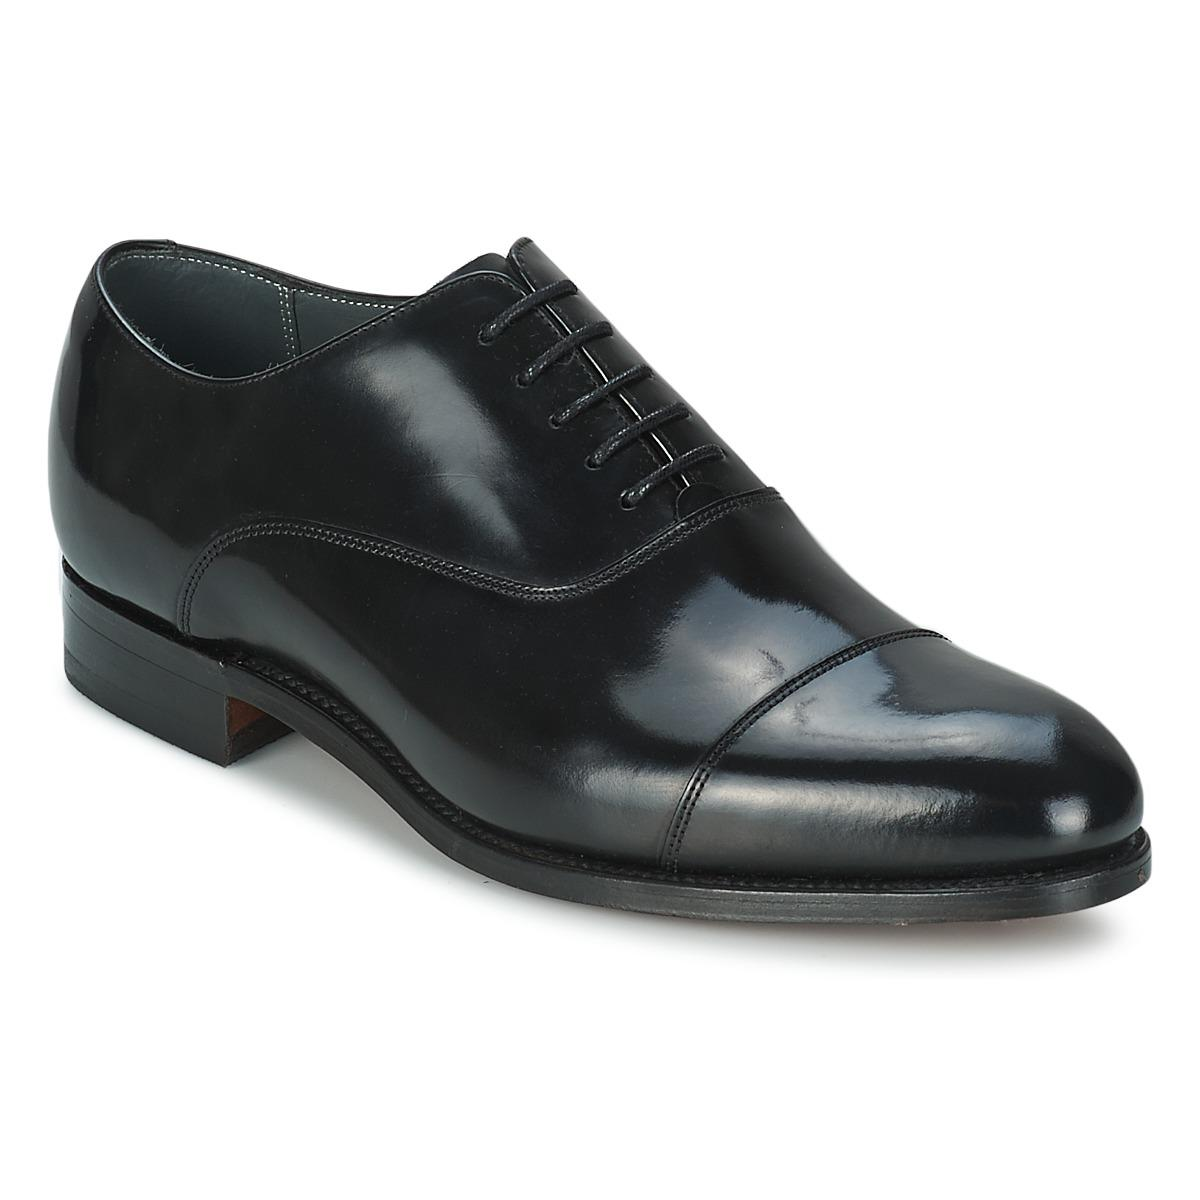 69da2ac8d475e Barker Winsford Smart / Formal Shoes in Black for Men - Save ...